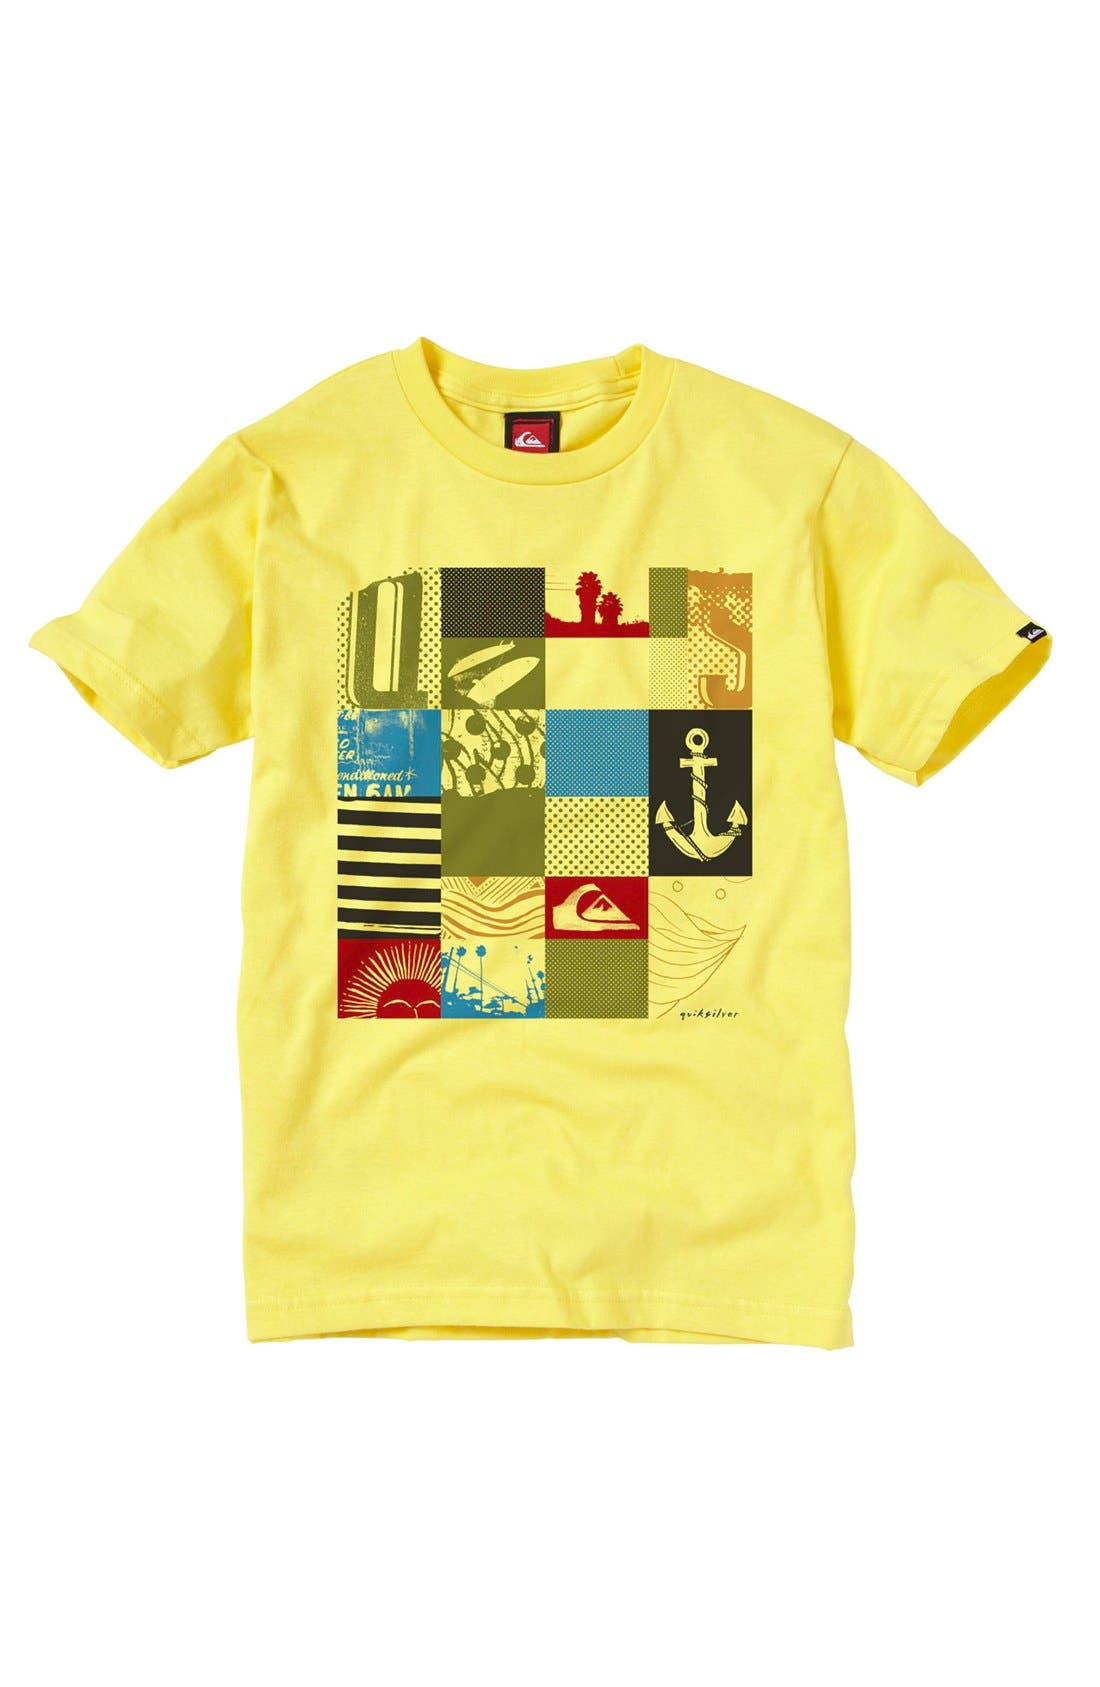 Main Image - Quiksilver 'Junk Drawer' T-Shirt (Big Boys)